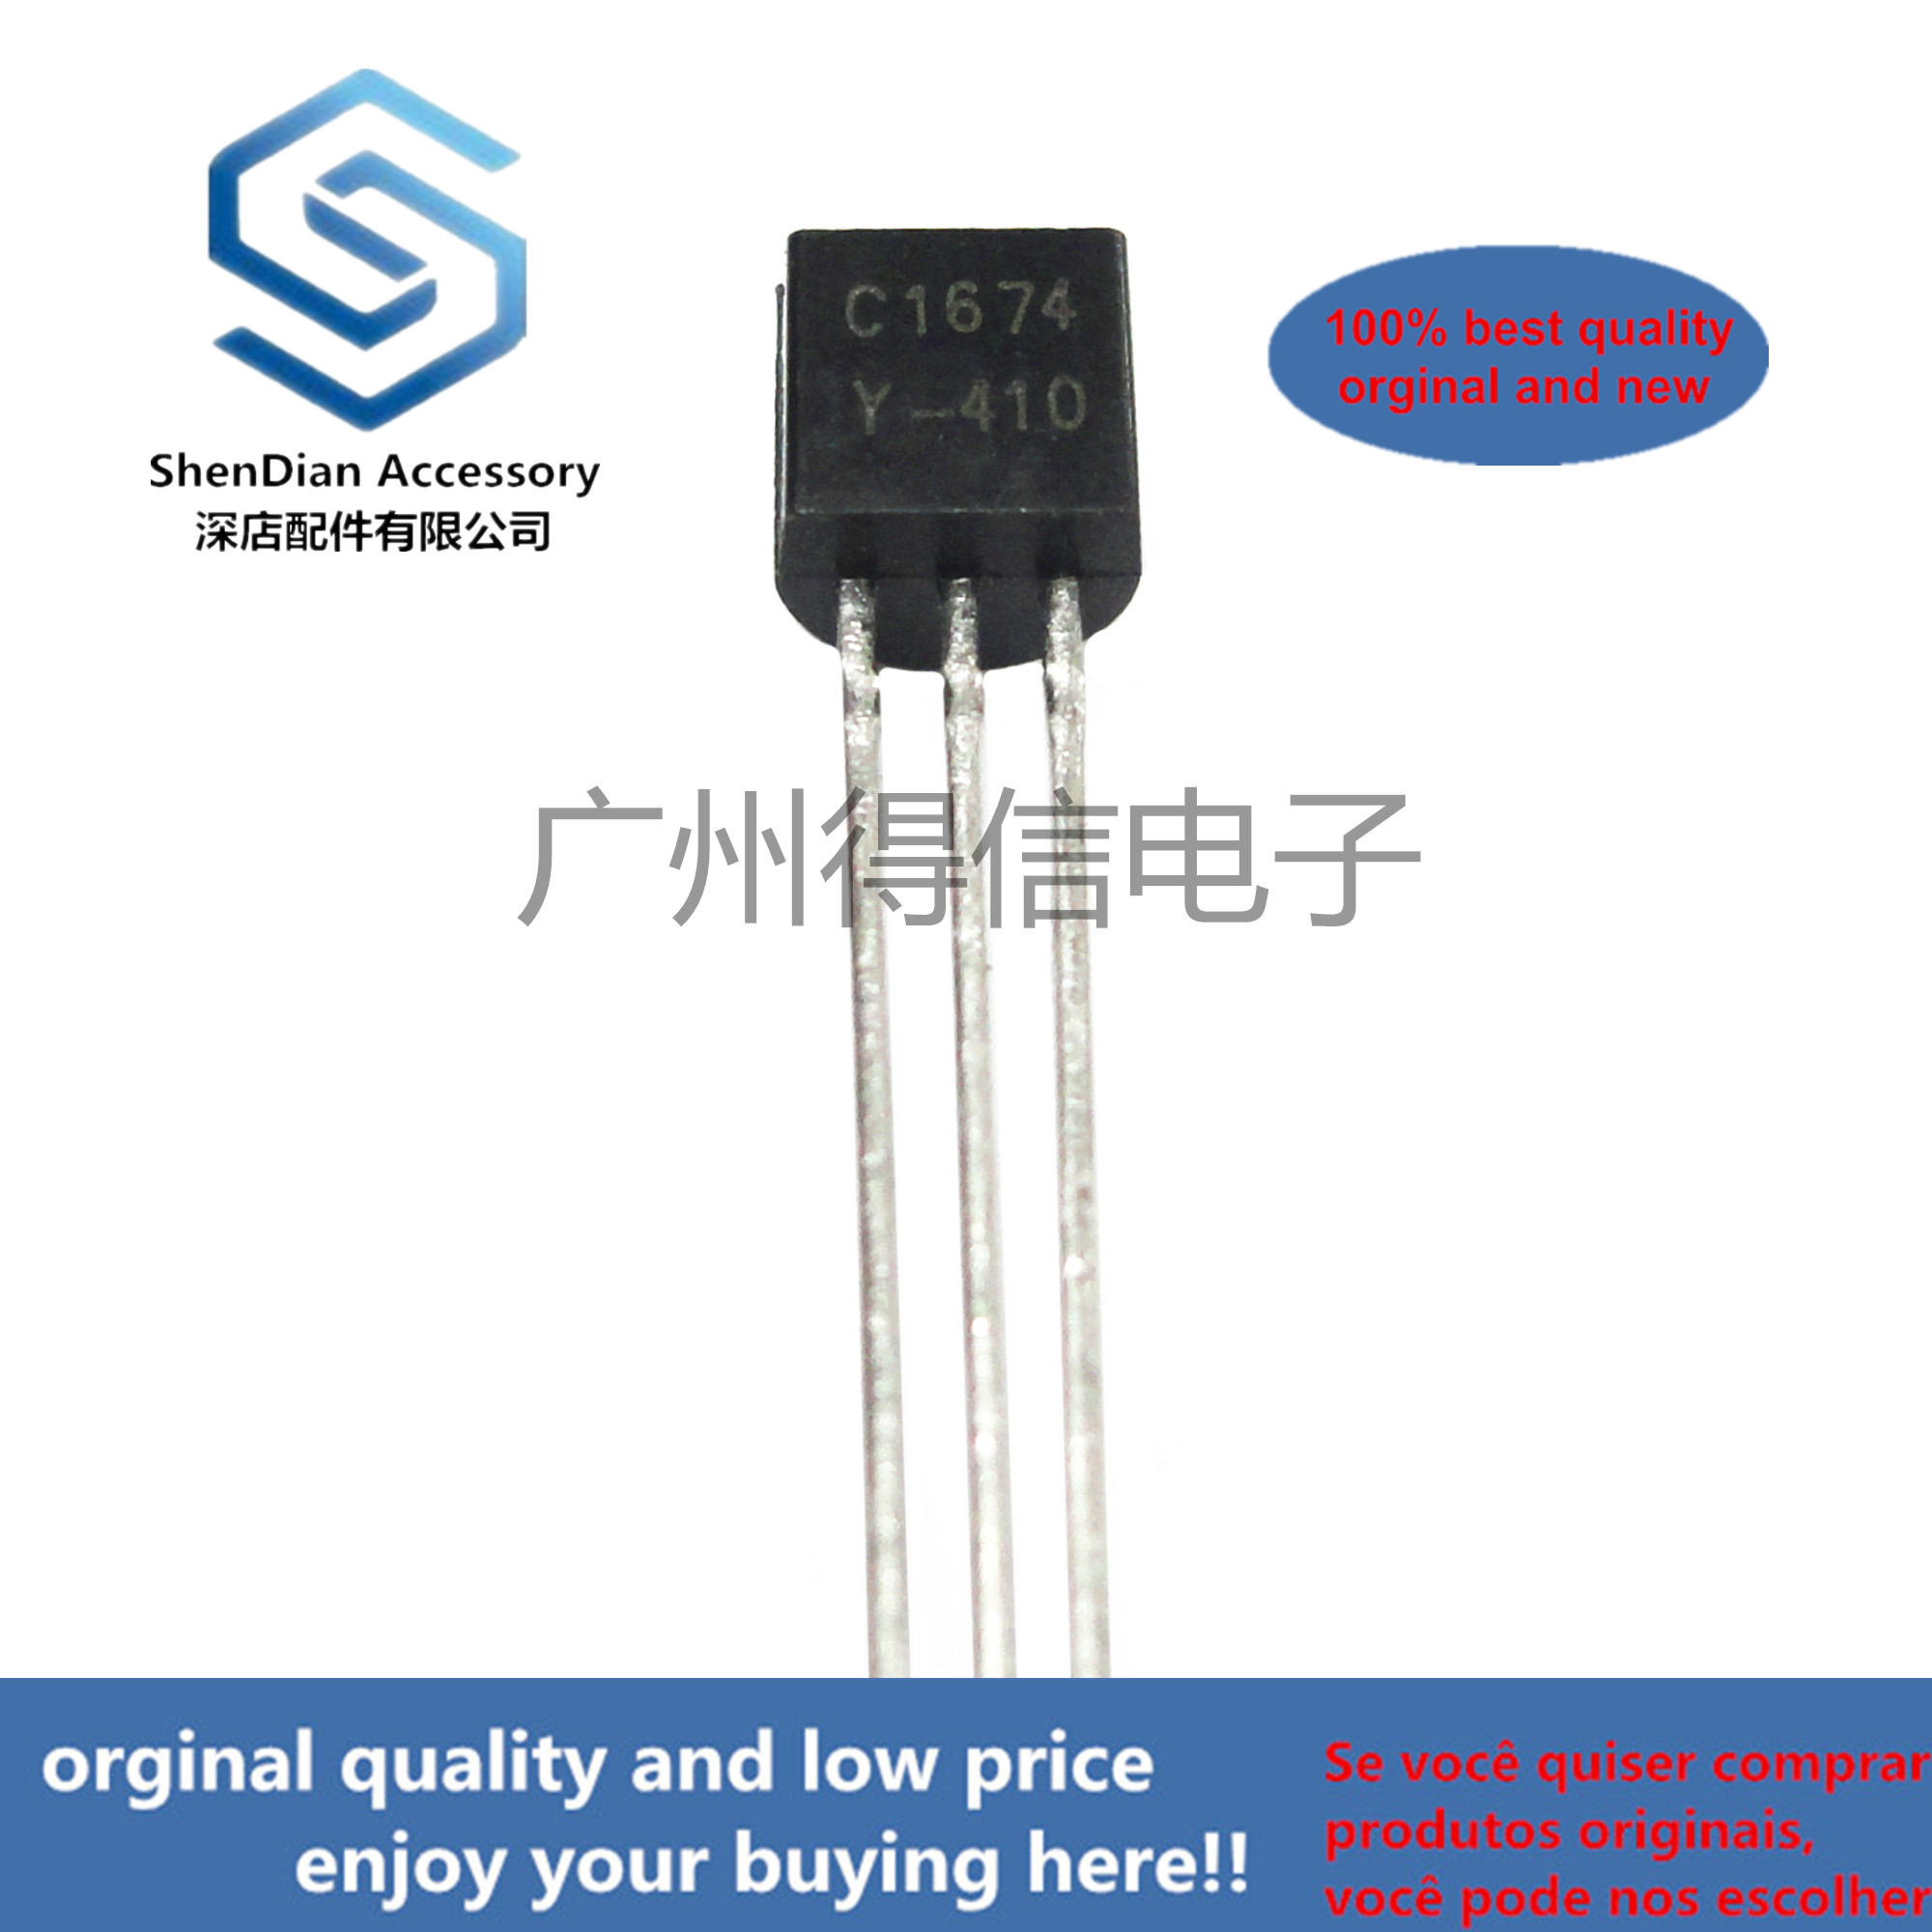 30pcs 100% Orginal New 2SC1674Y C1674 EBC TO-92 Real Photo